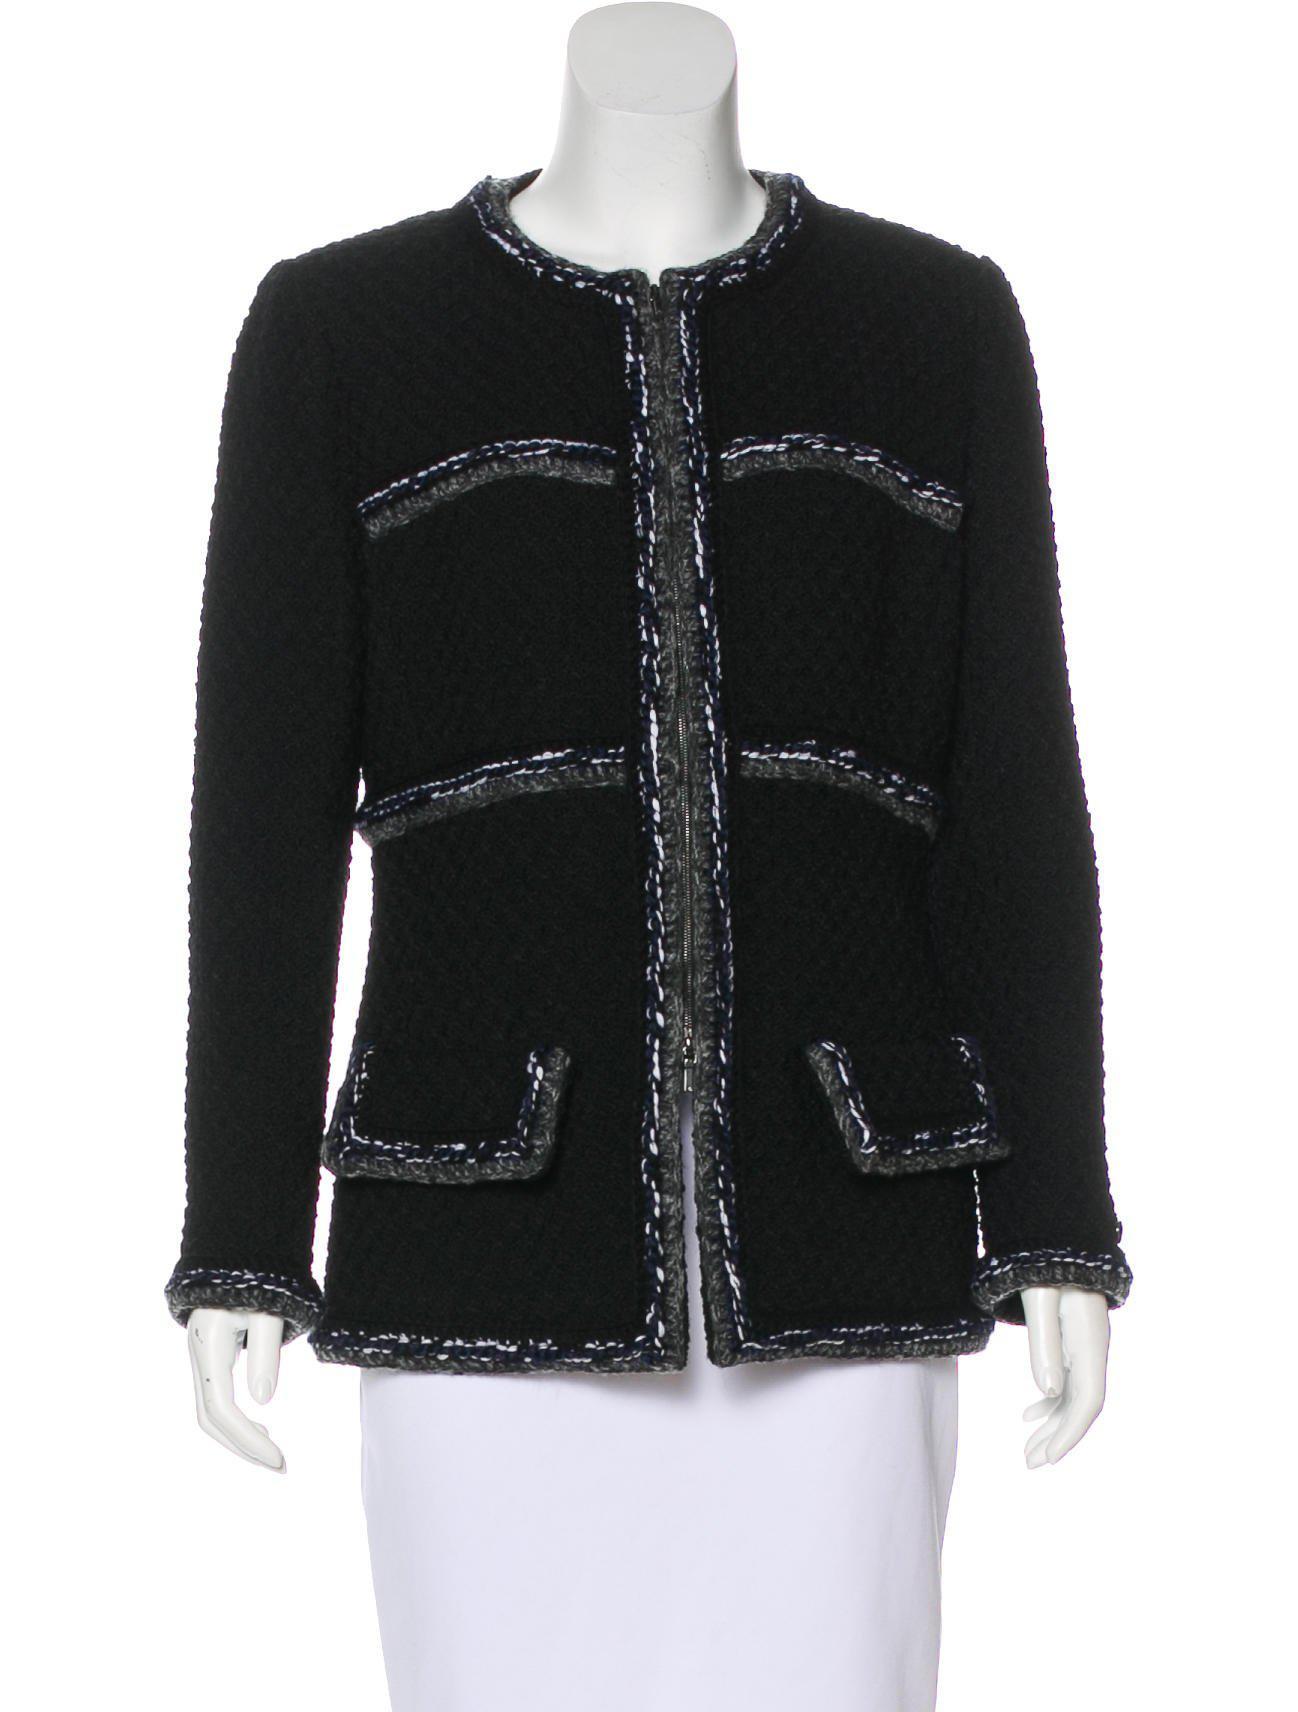 Chanel black jacket 2017